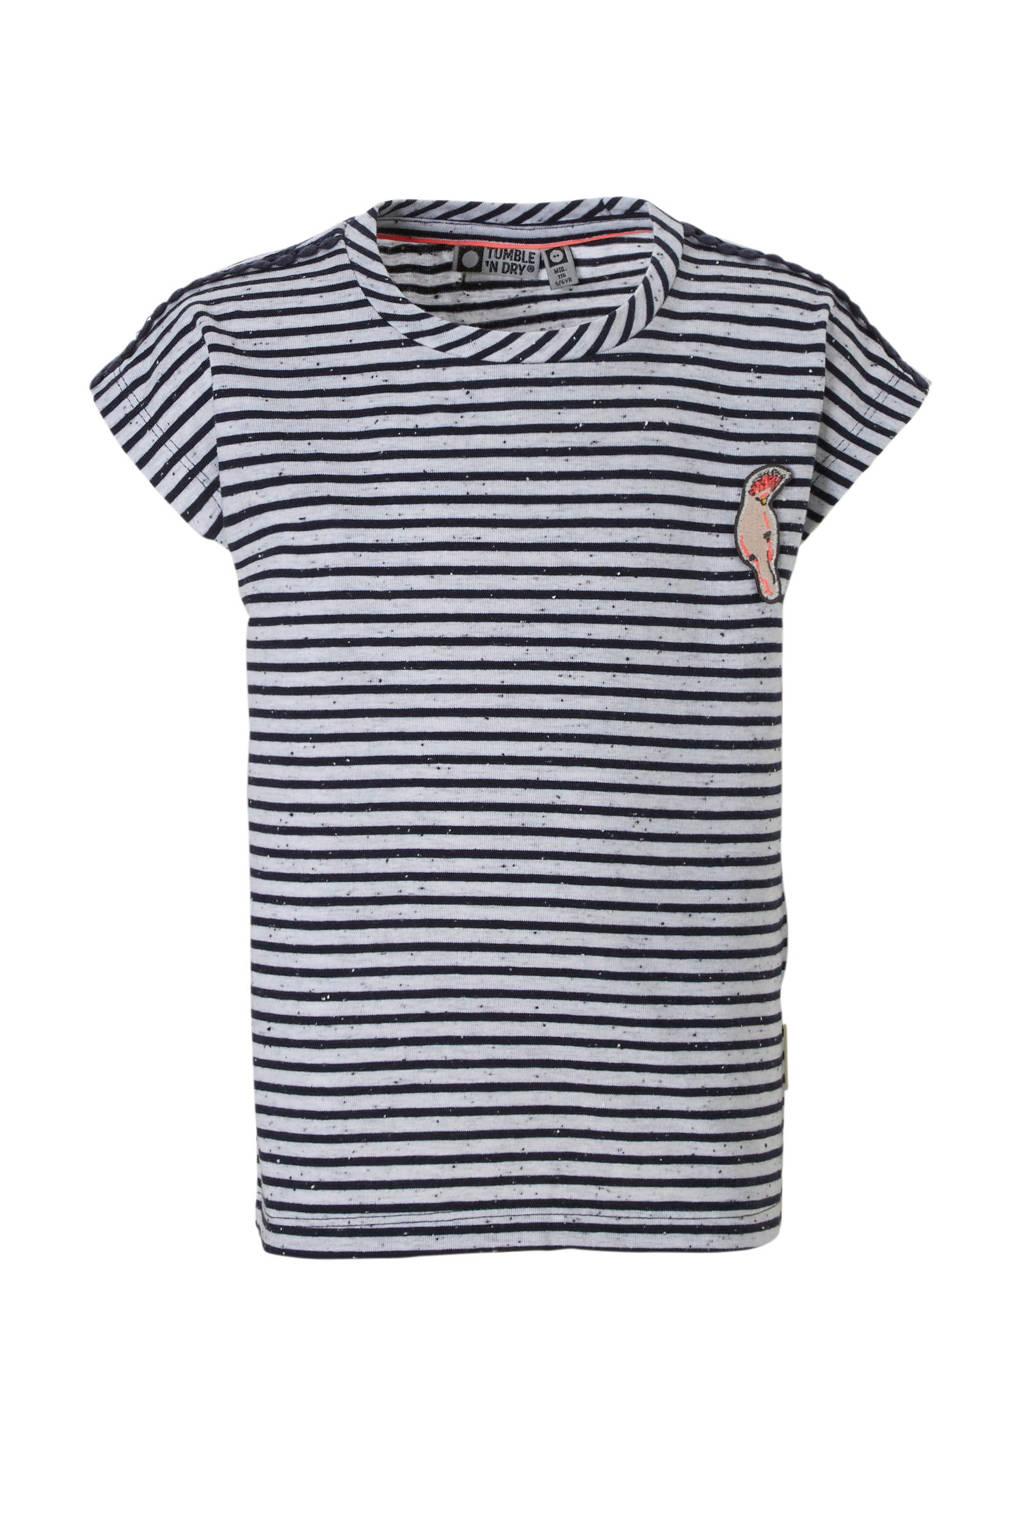 Tumble 'n Dry Mid gestreepte T-shirt grijs, Grijs/blauw